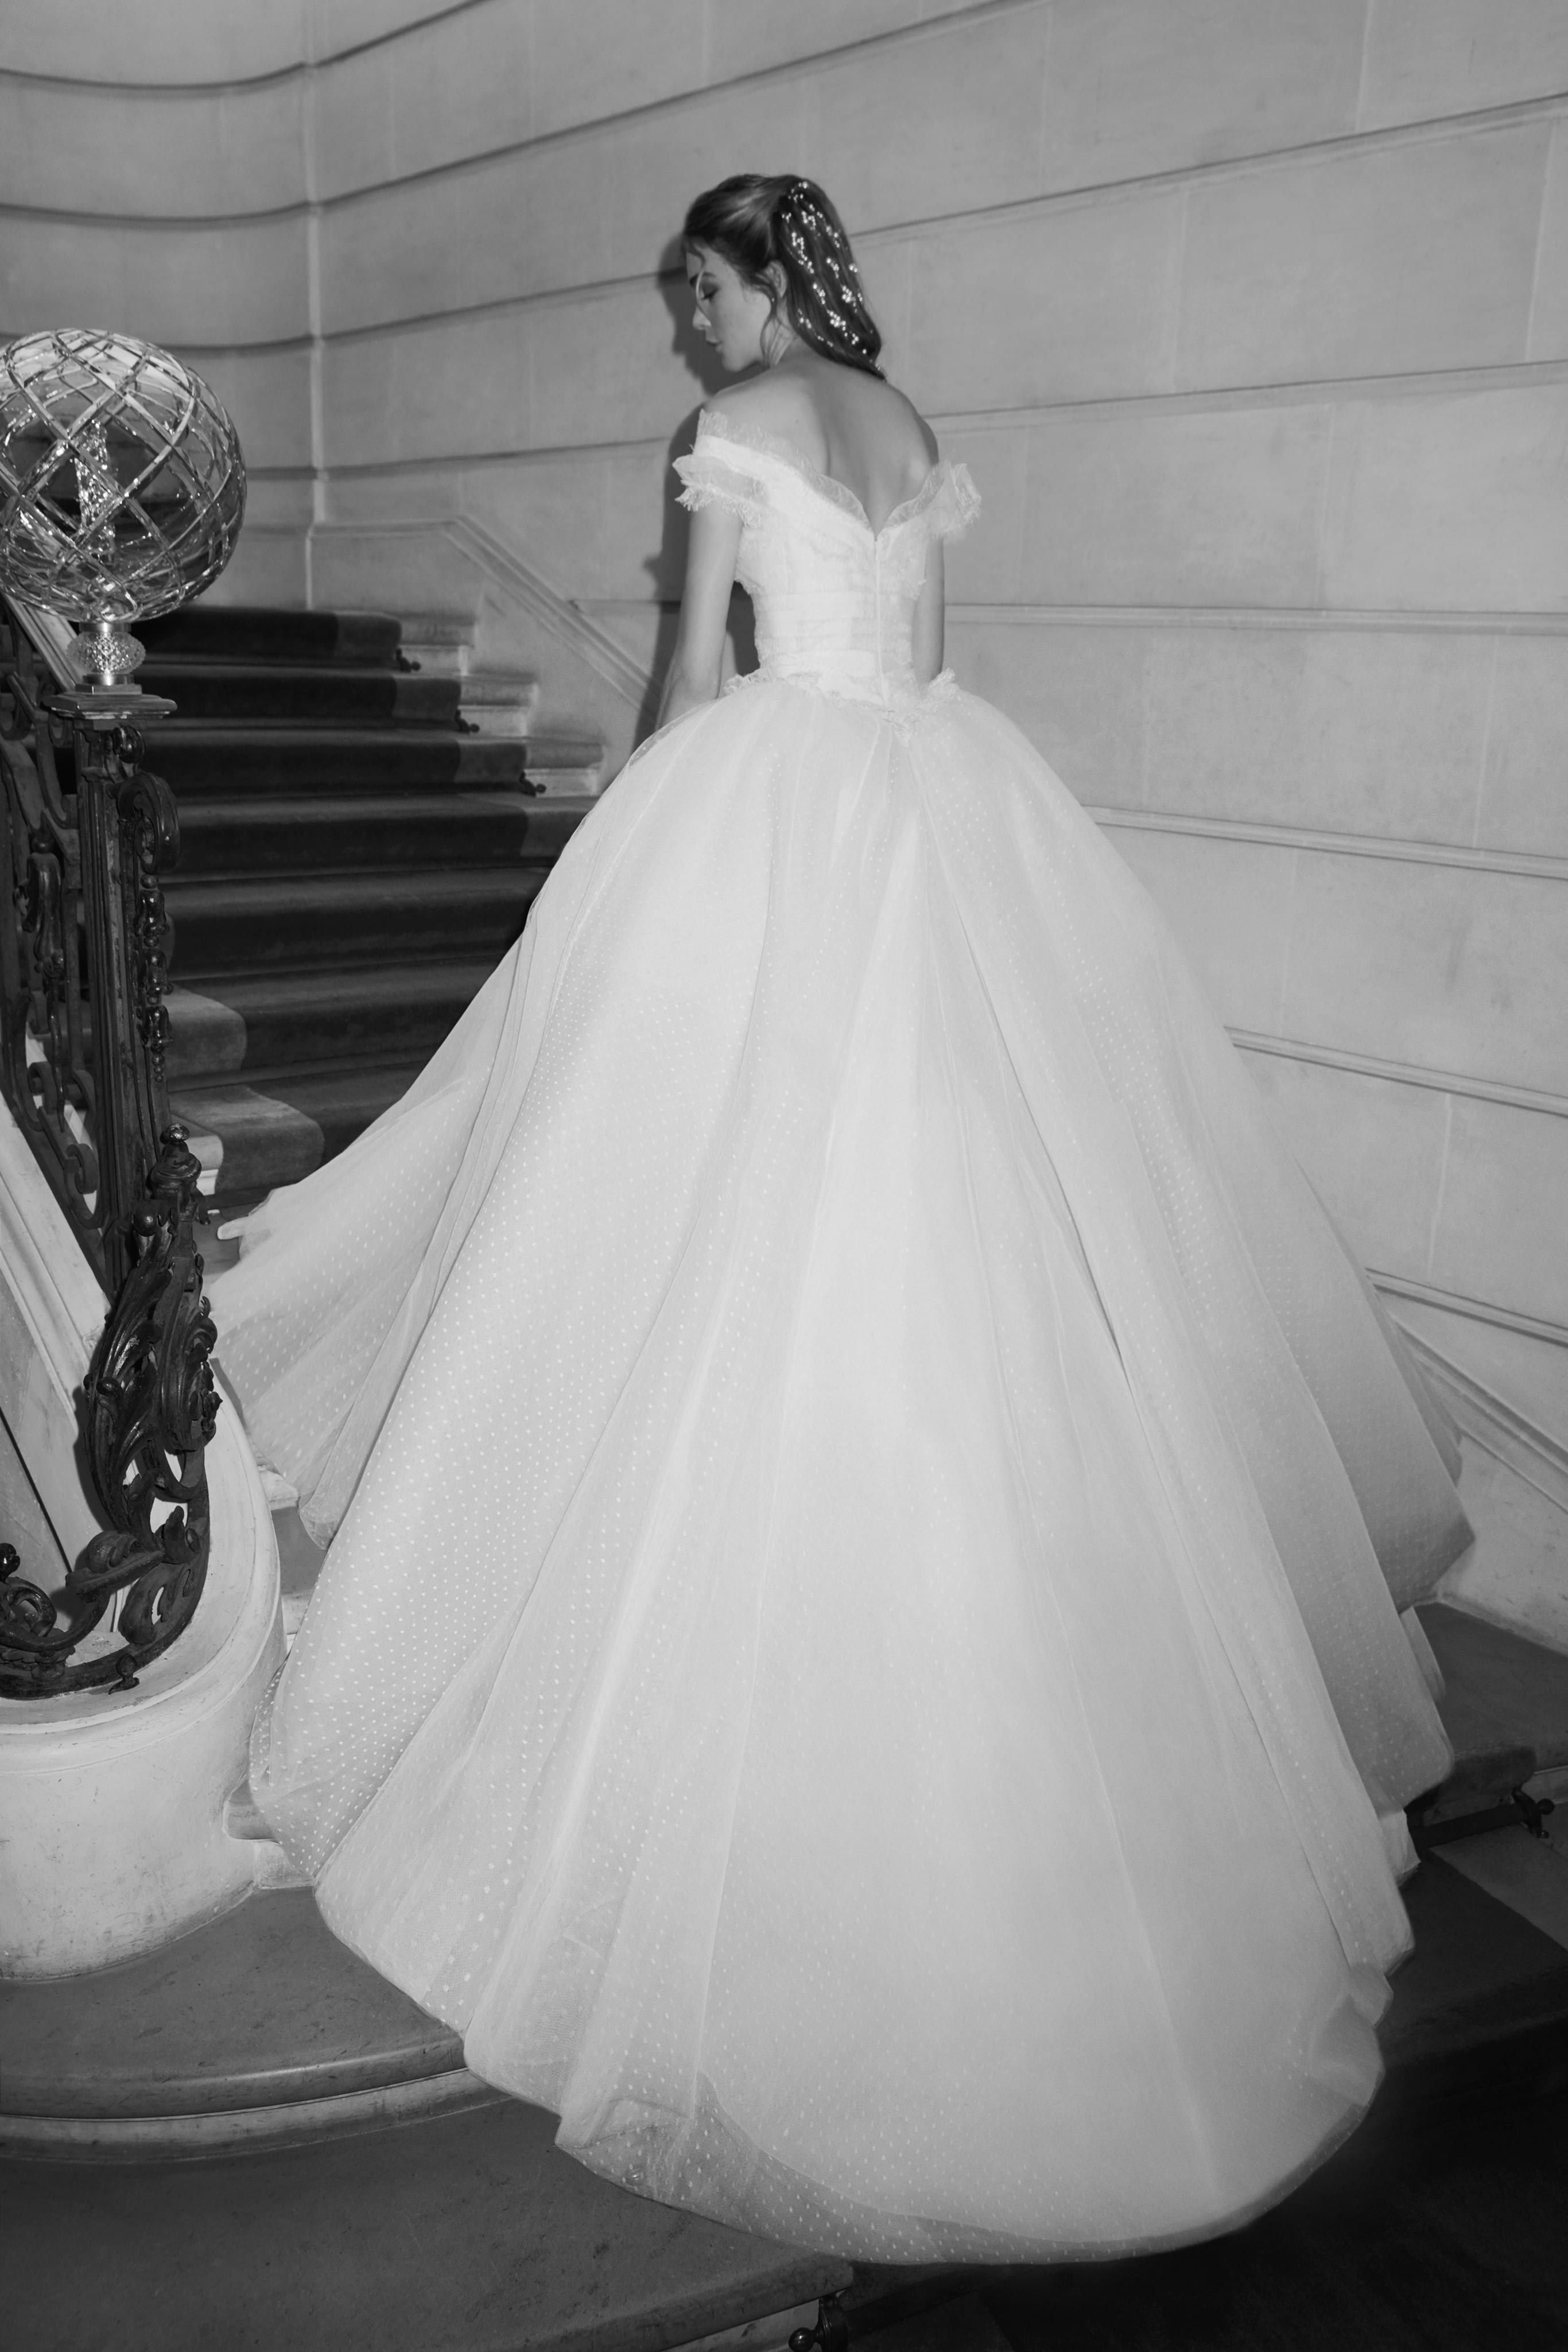 1f653c3a8830 Elie Saab Bridal Spring 2019 Fashion Show | Romance, Romantic ...